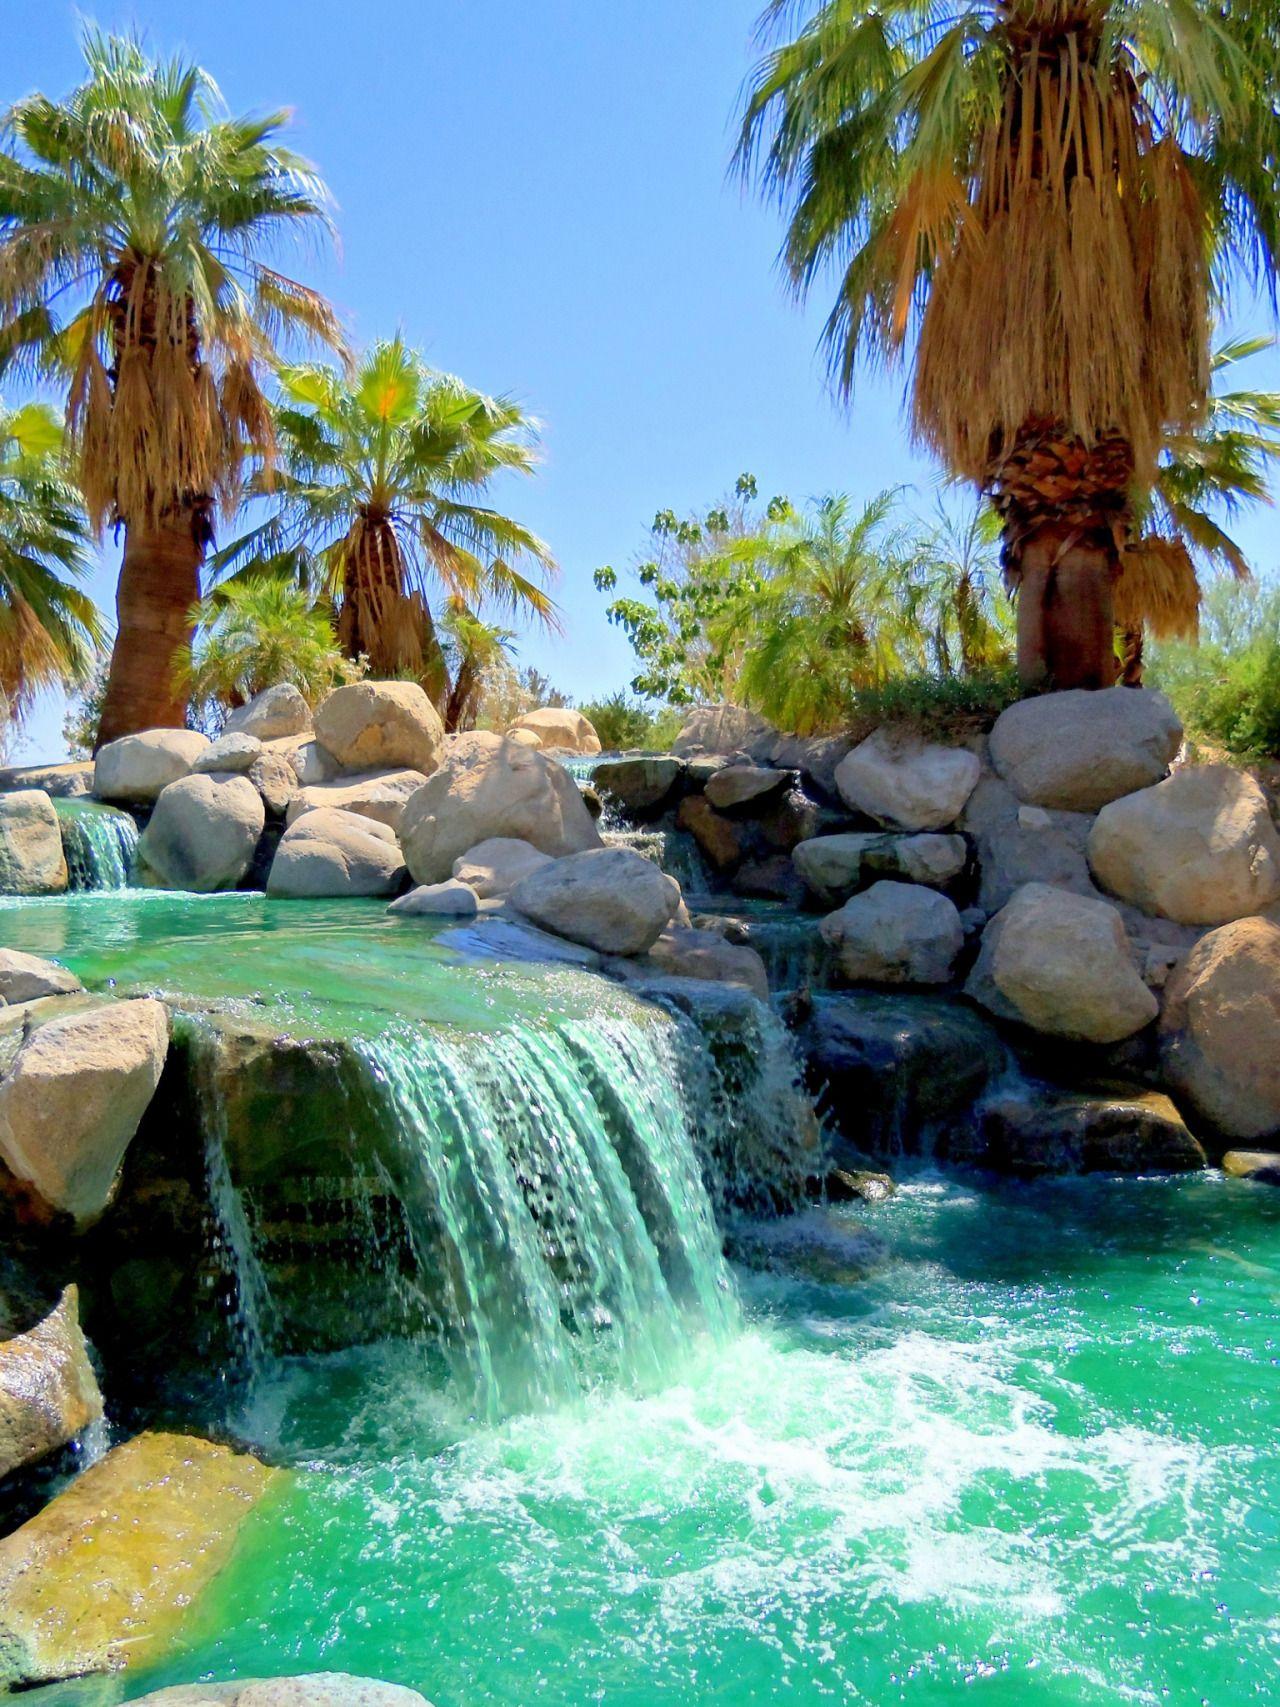 Sheraton Desert Oasis Villas, Scottsdale, Arizona by